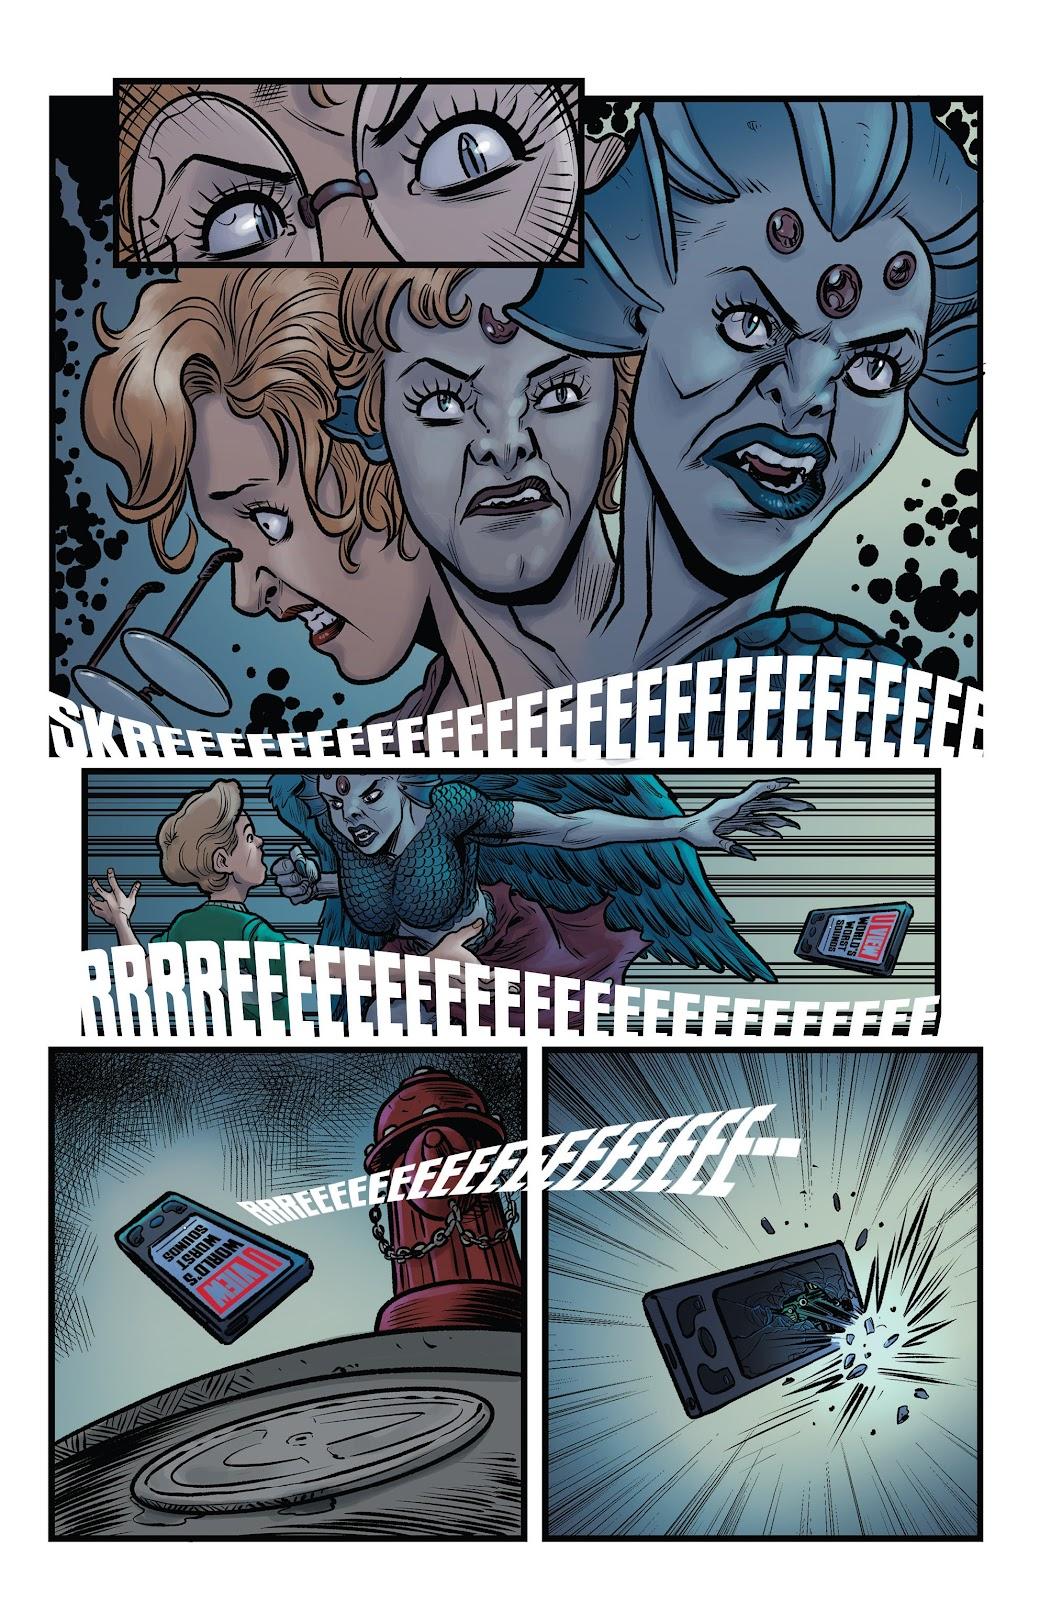 Read online Black Betty comic -  Issue #8 - 8